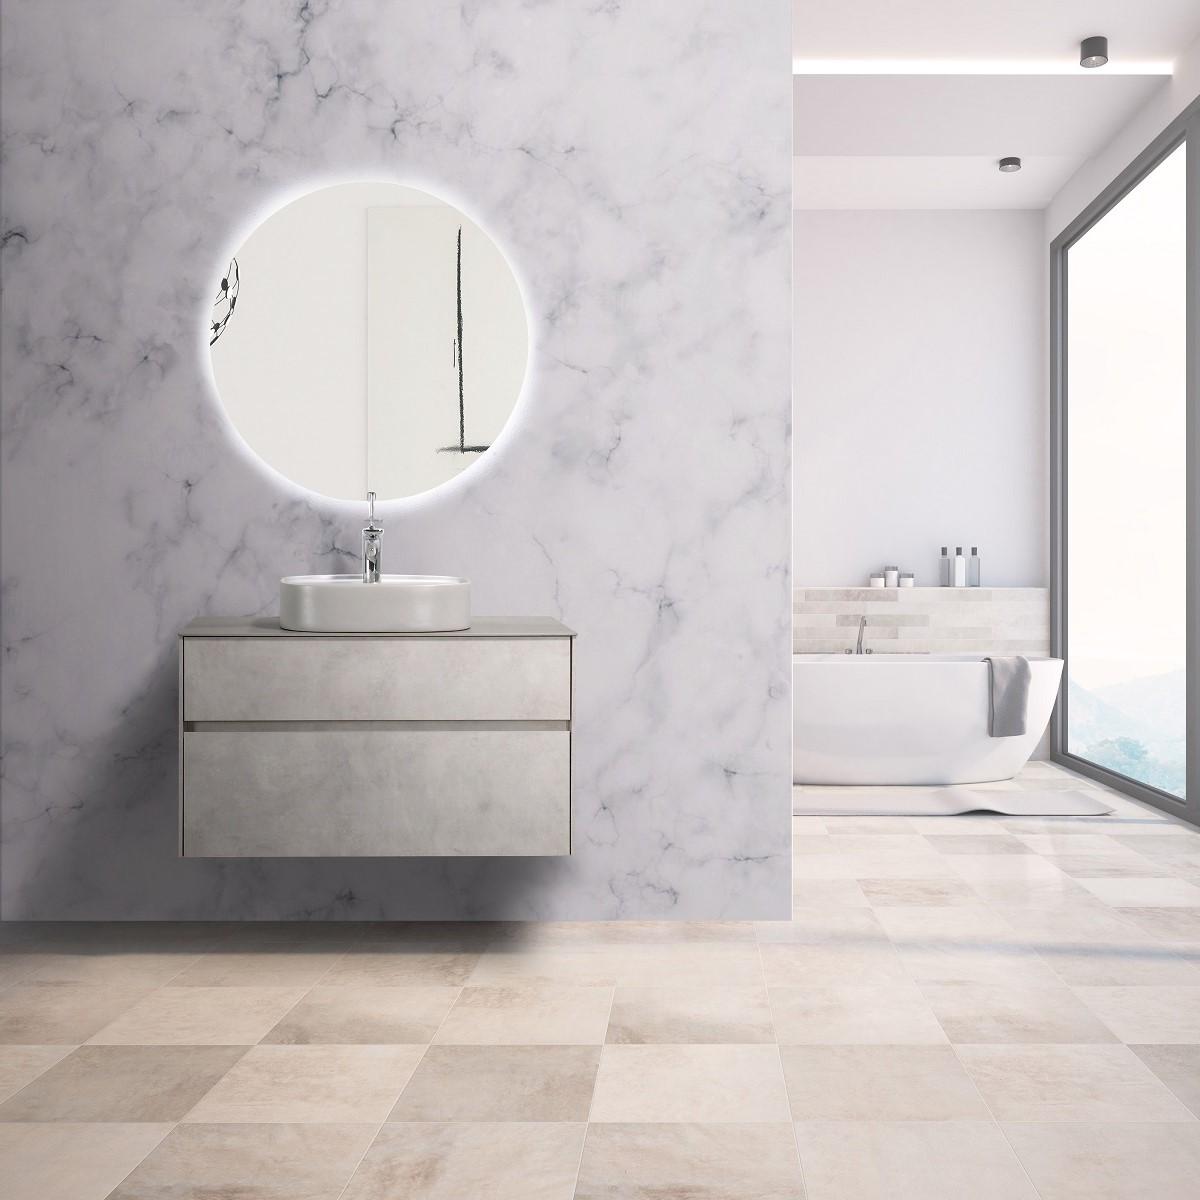 Lamina Vanity in cement grey - 900mm vanity